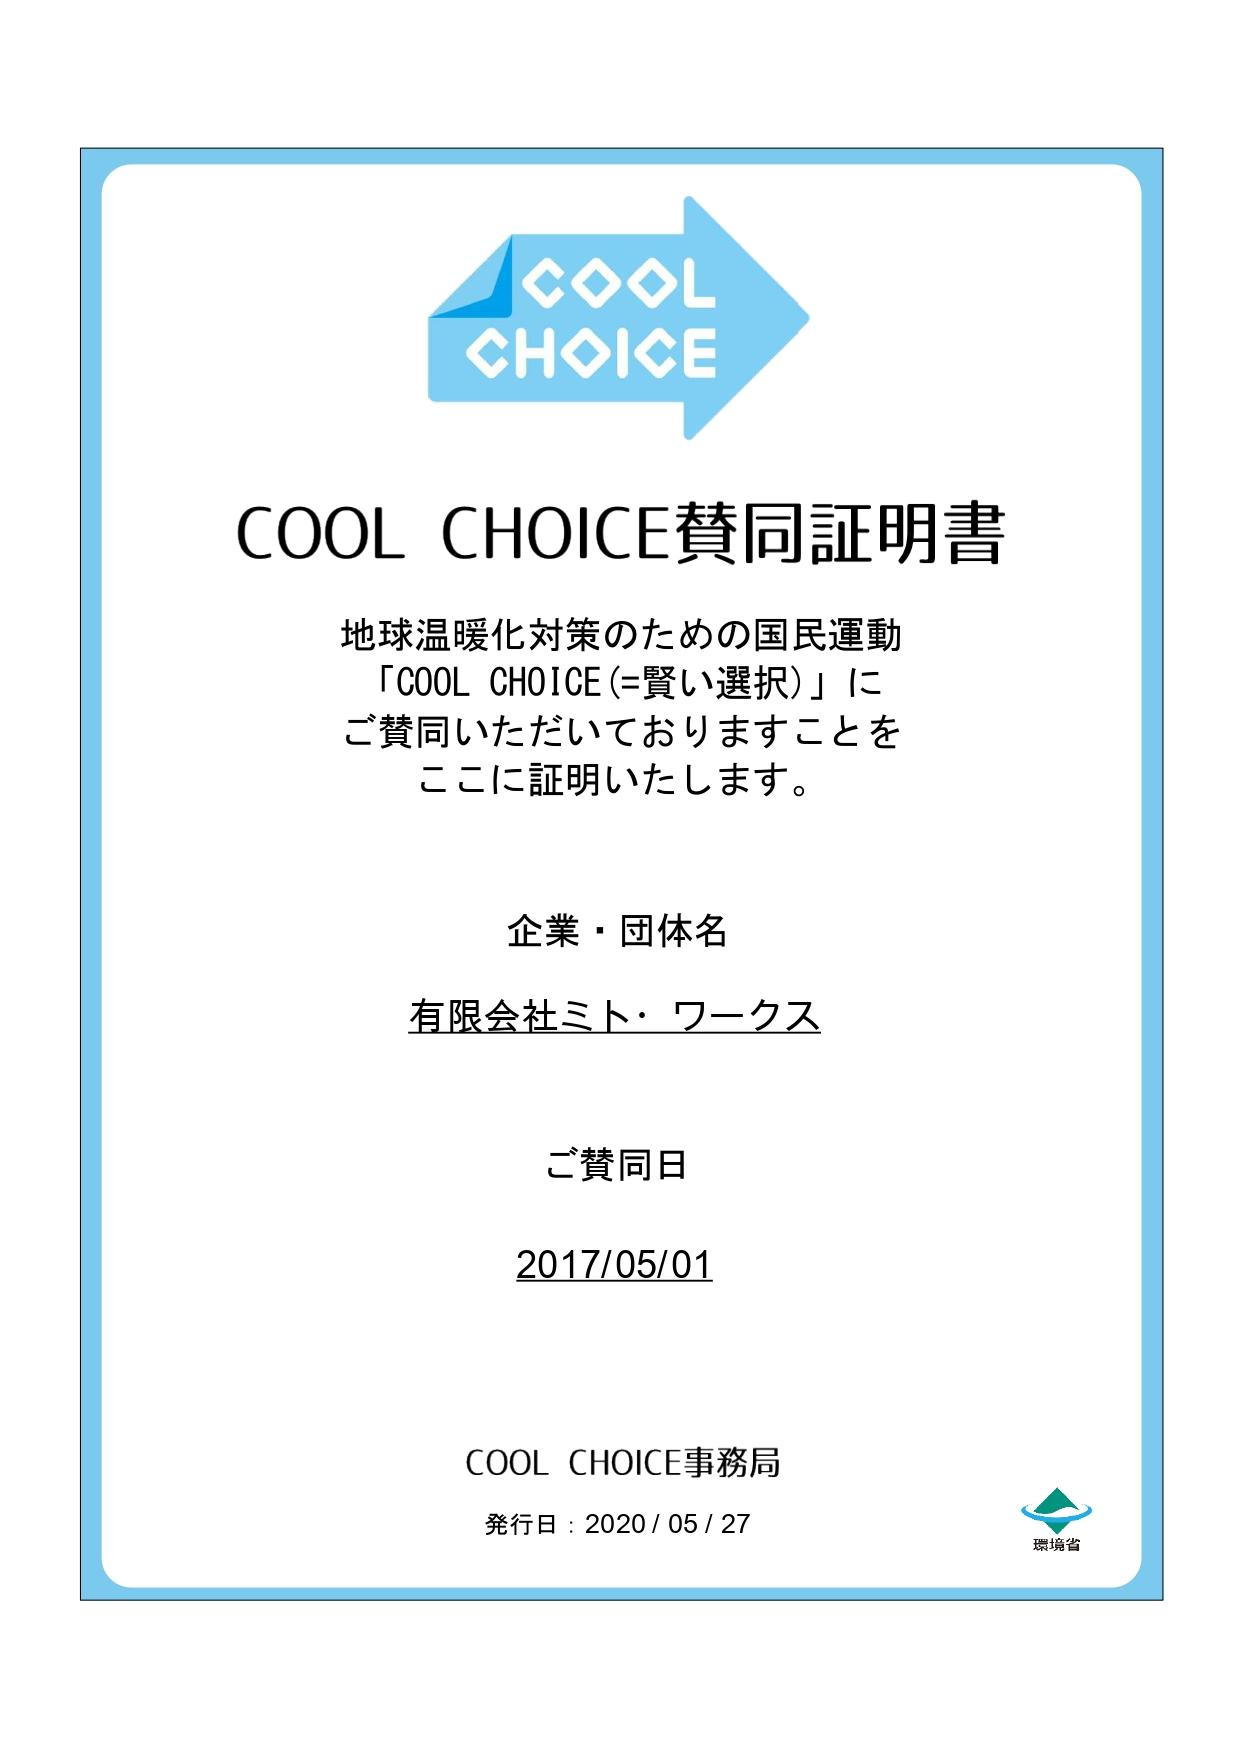 「COOL CHOICE」に参加しています。